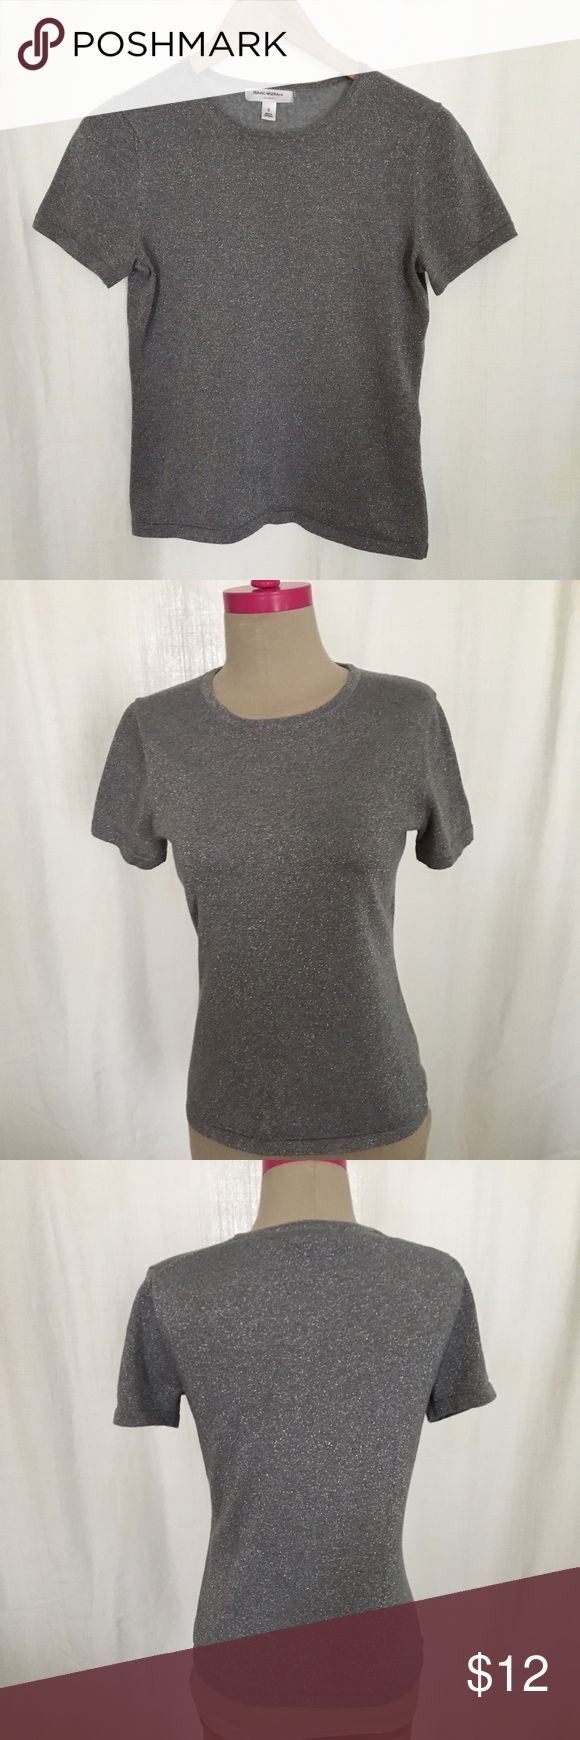 Silver metallic tee Sparkly t-shirt sweater,  great condition! Isaac Mizrahi Tops Tees - Short Sleeve